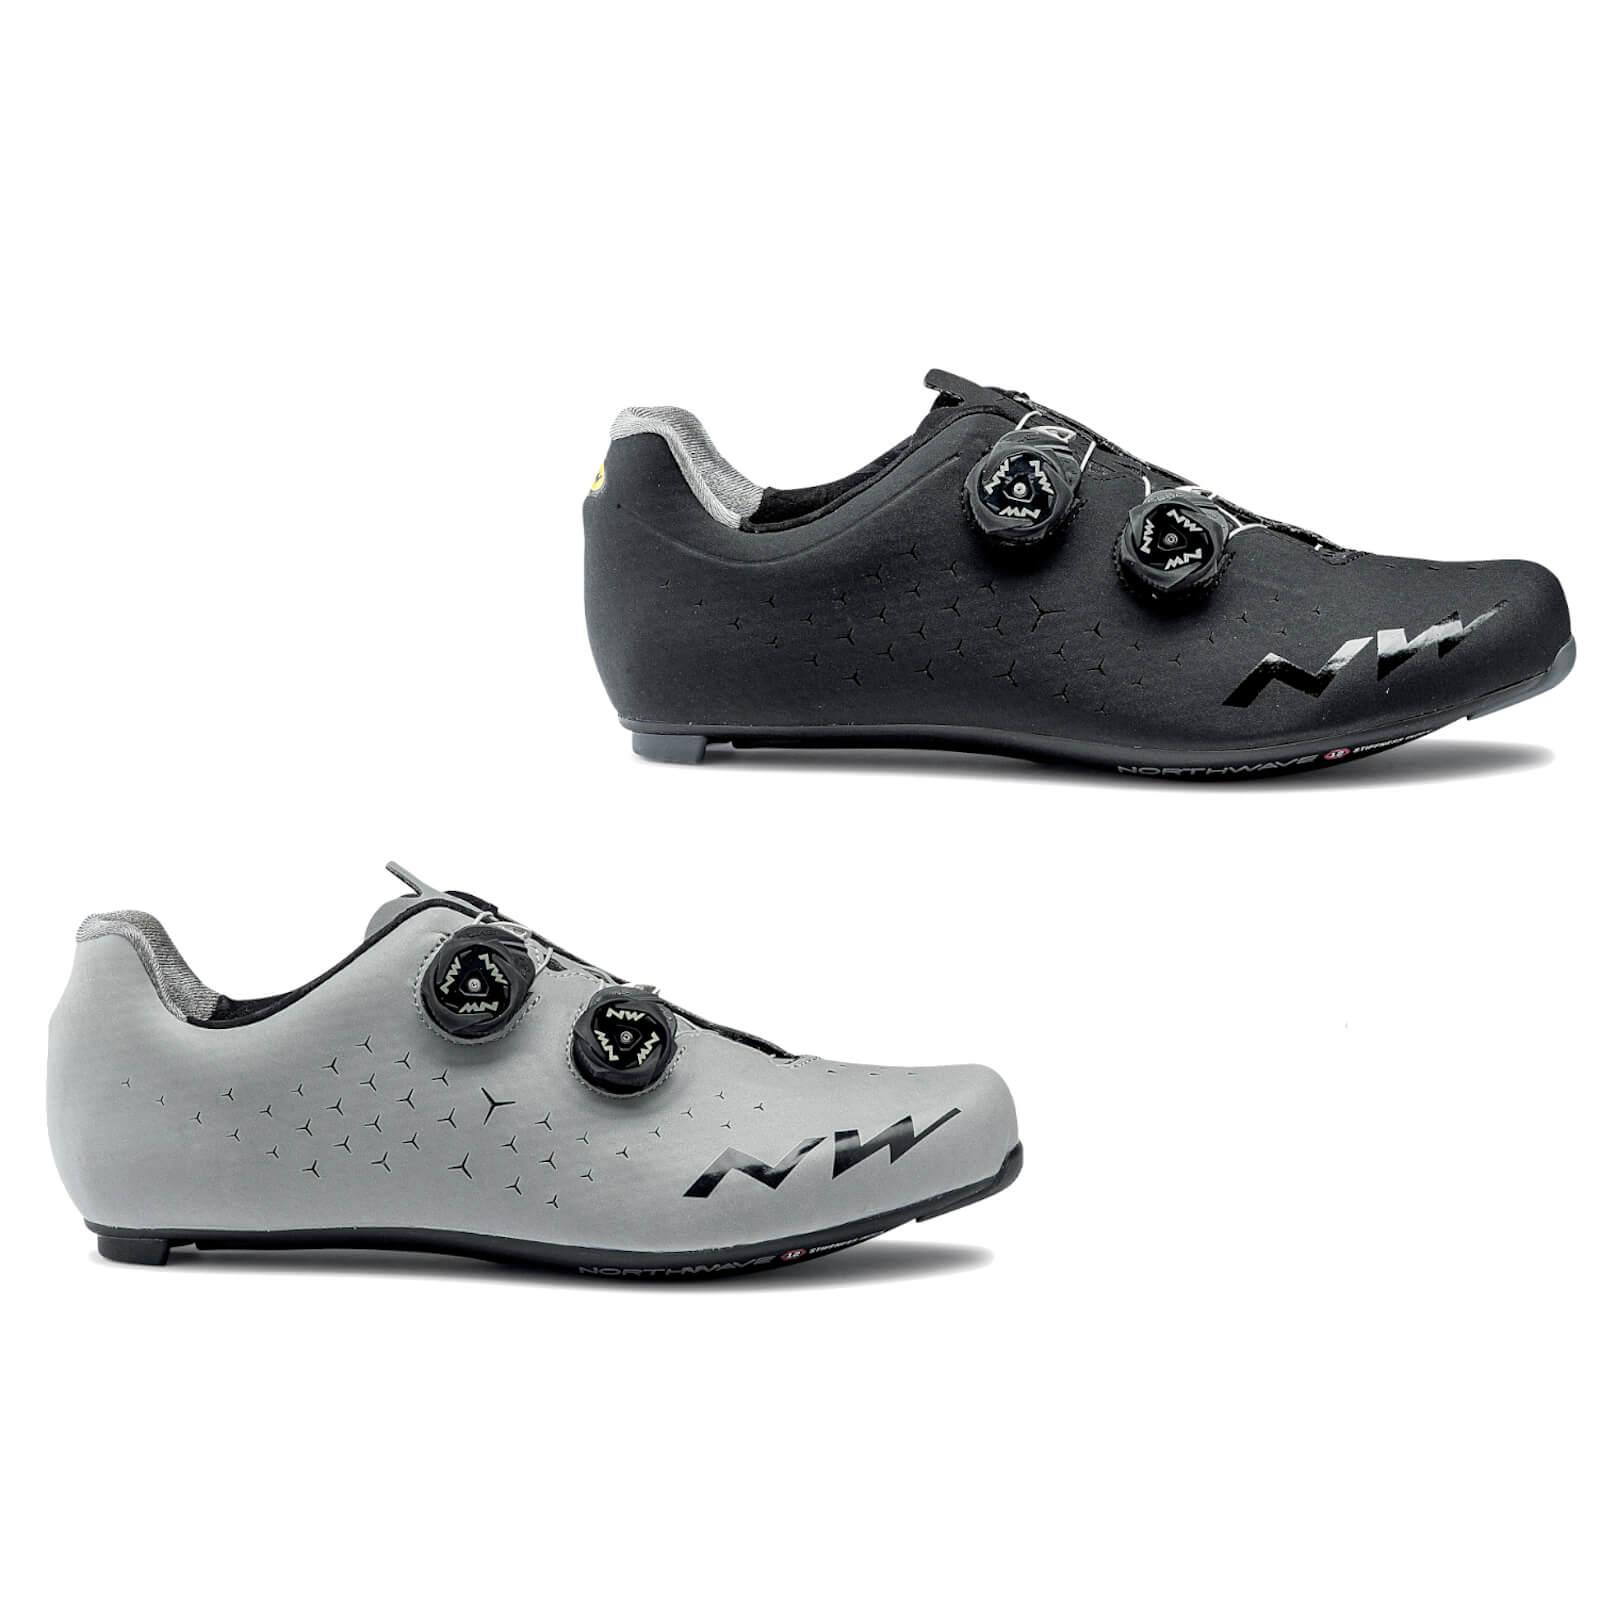 Northwave Revolution 2 Road Shoes - EU 39 - Reflective